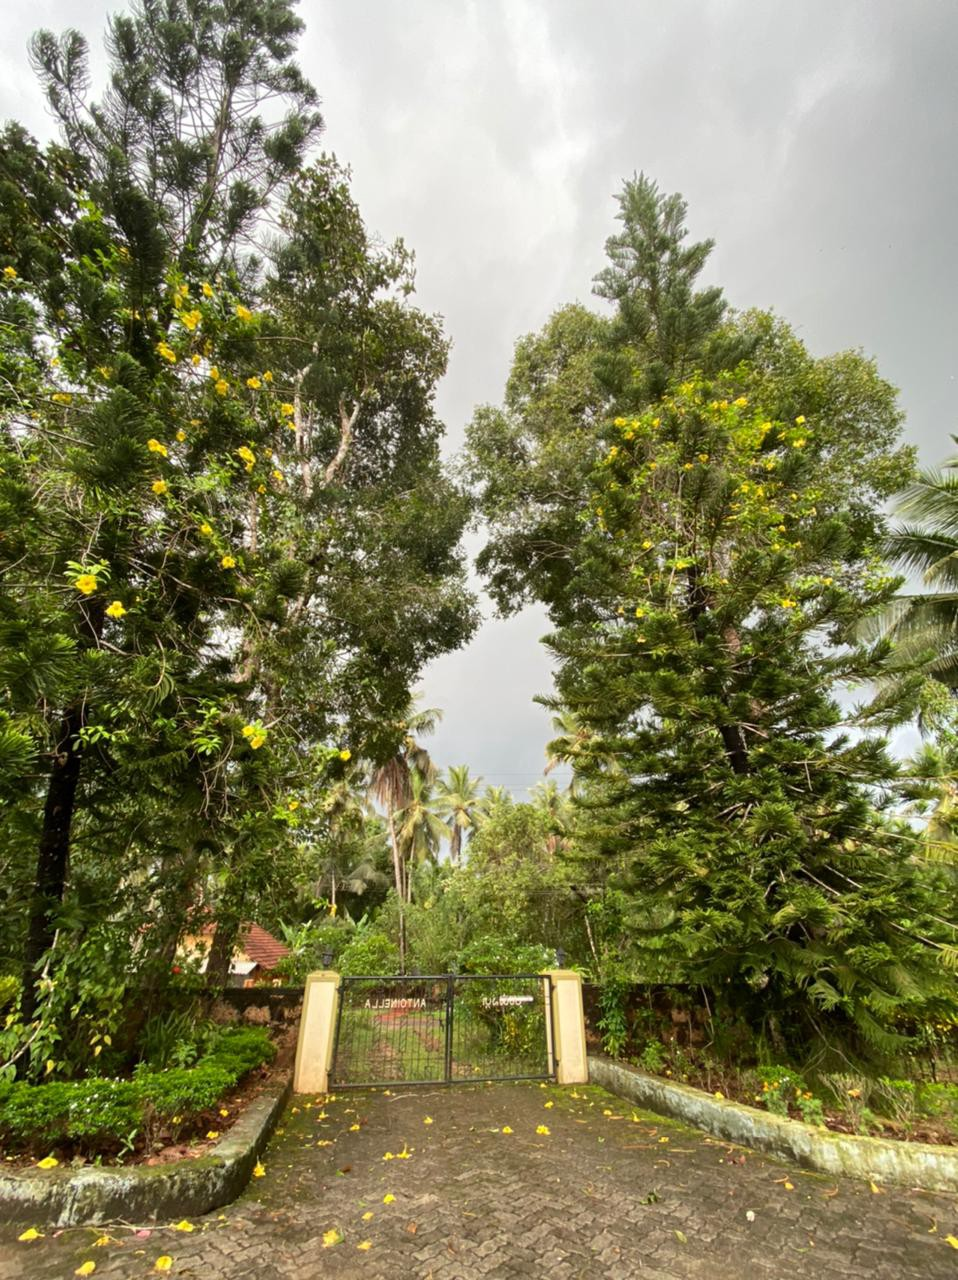 My home—Antoinella